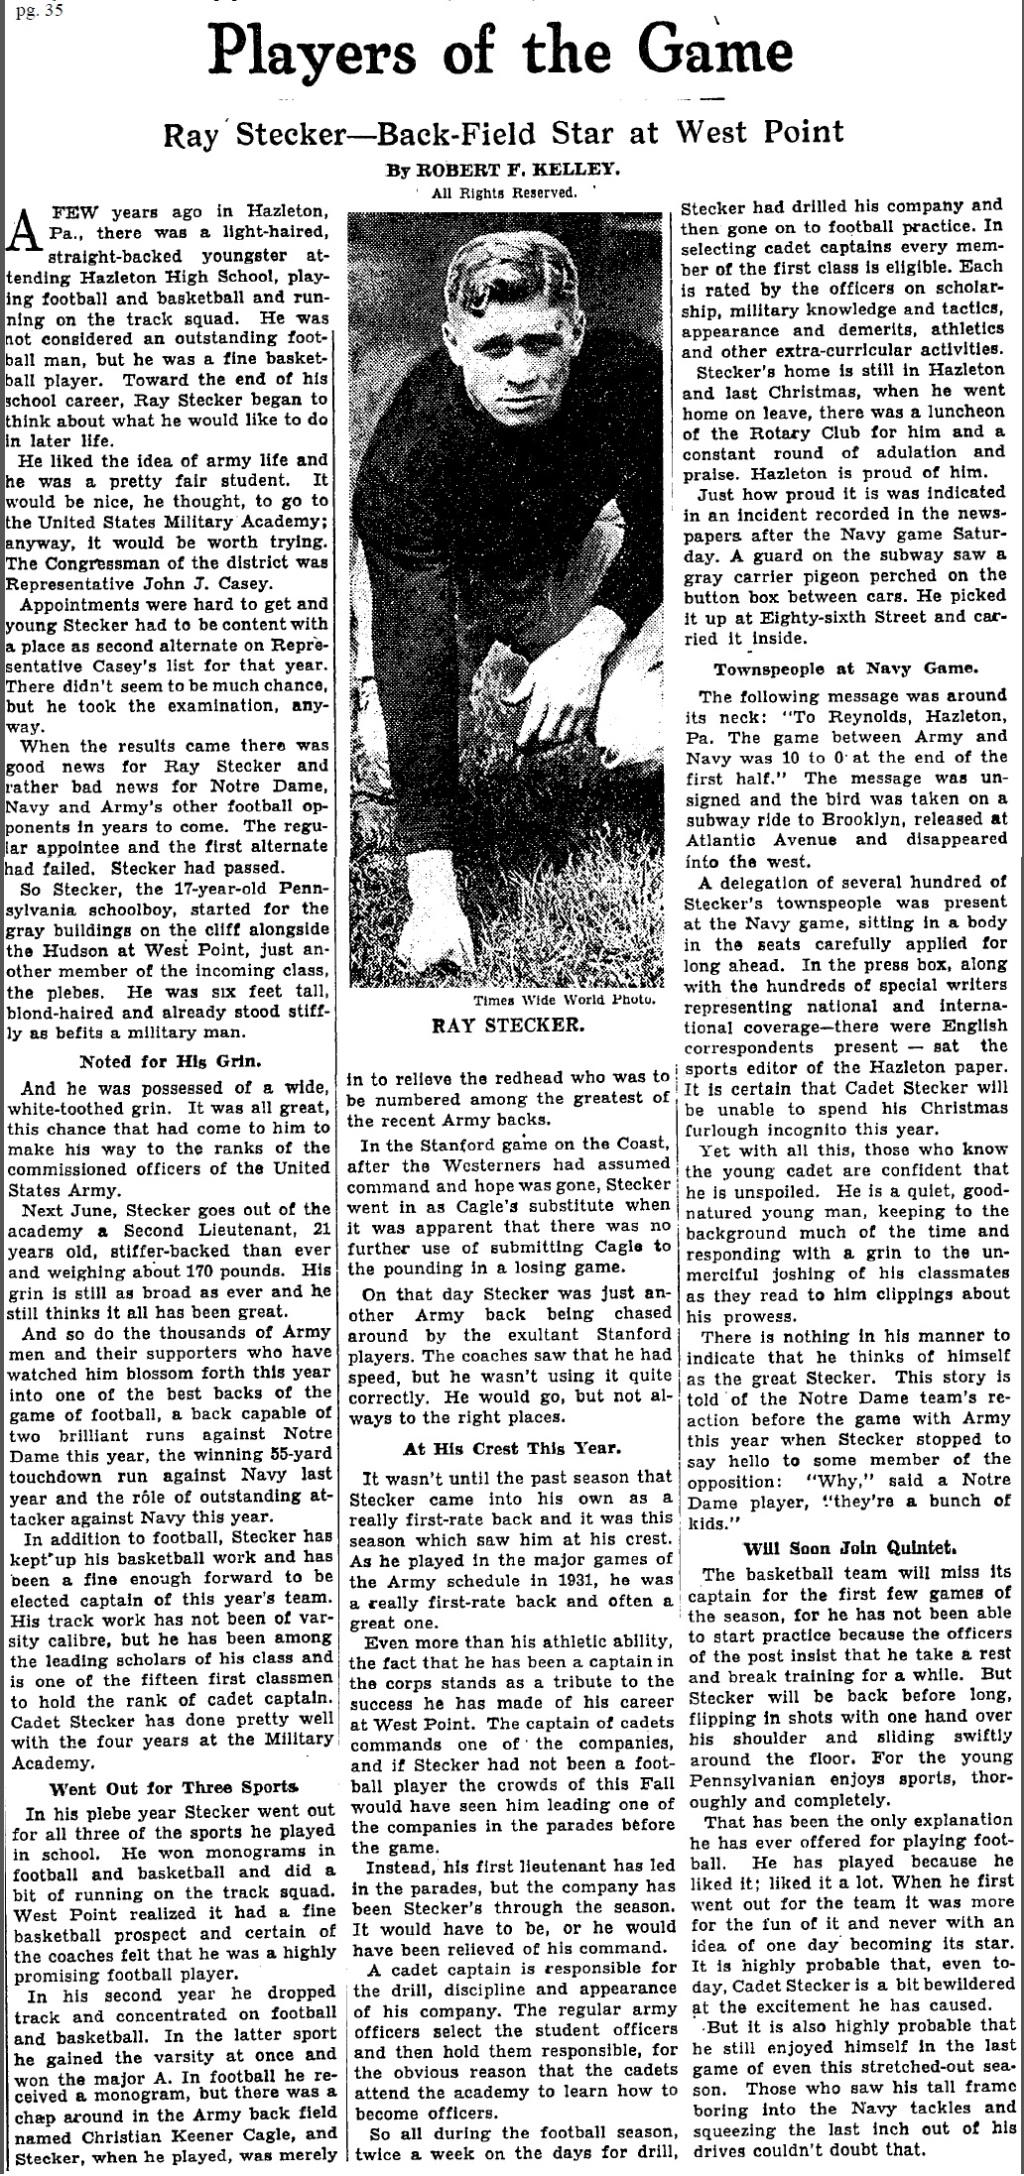 ArmyFB_1931_RayStecker_NYT_Dec151931